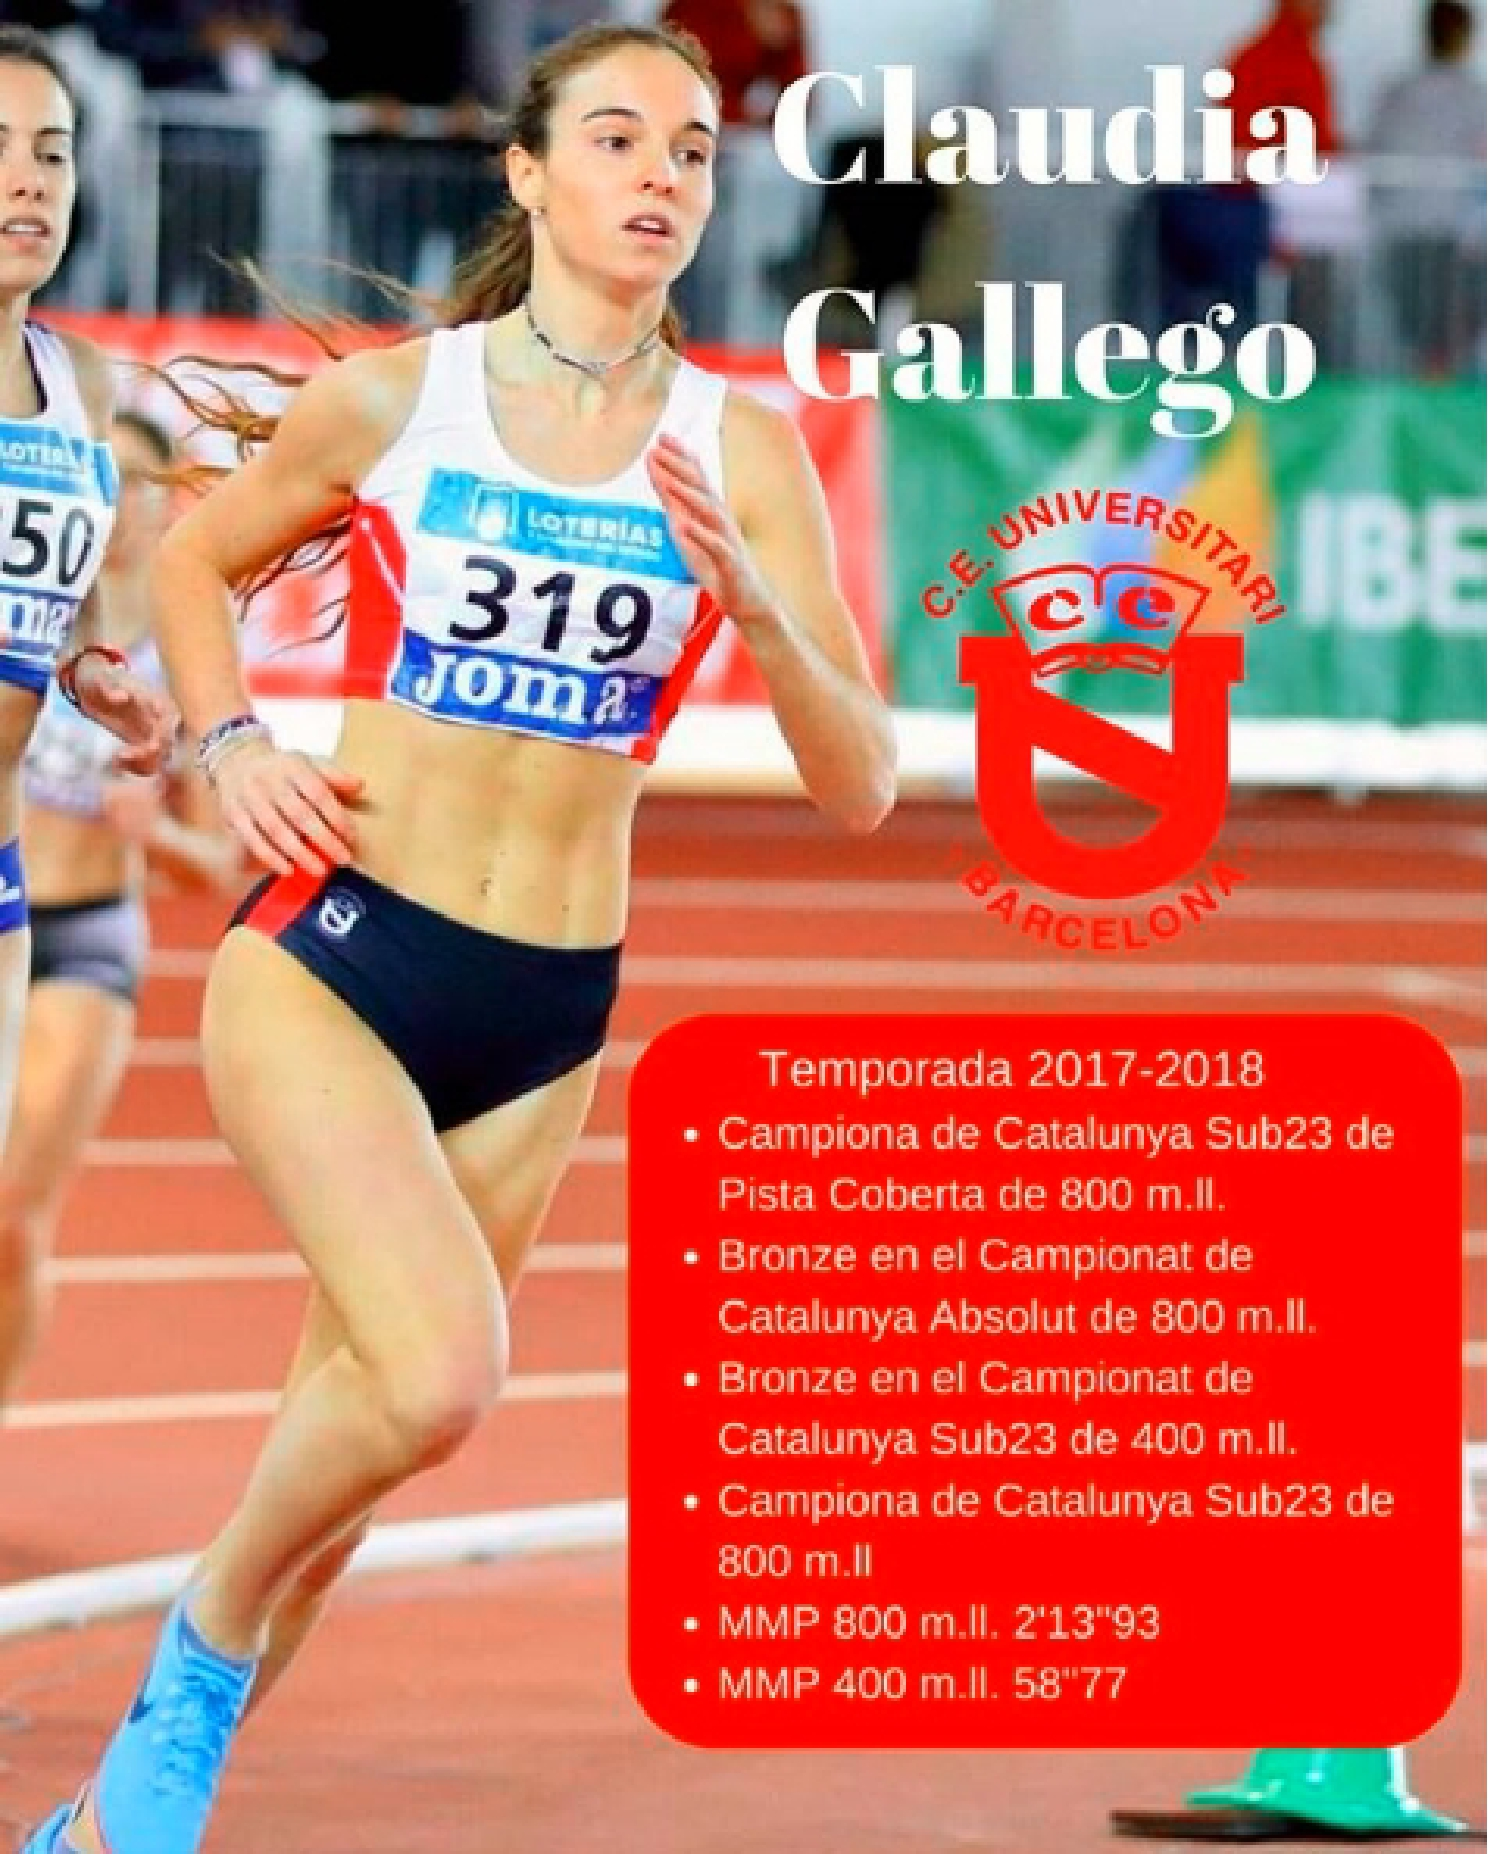 Claudia Gallego Sotelo